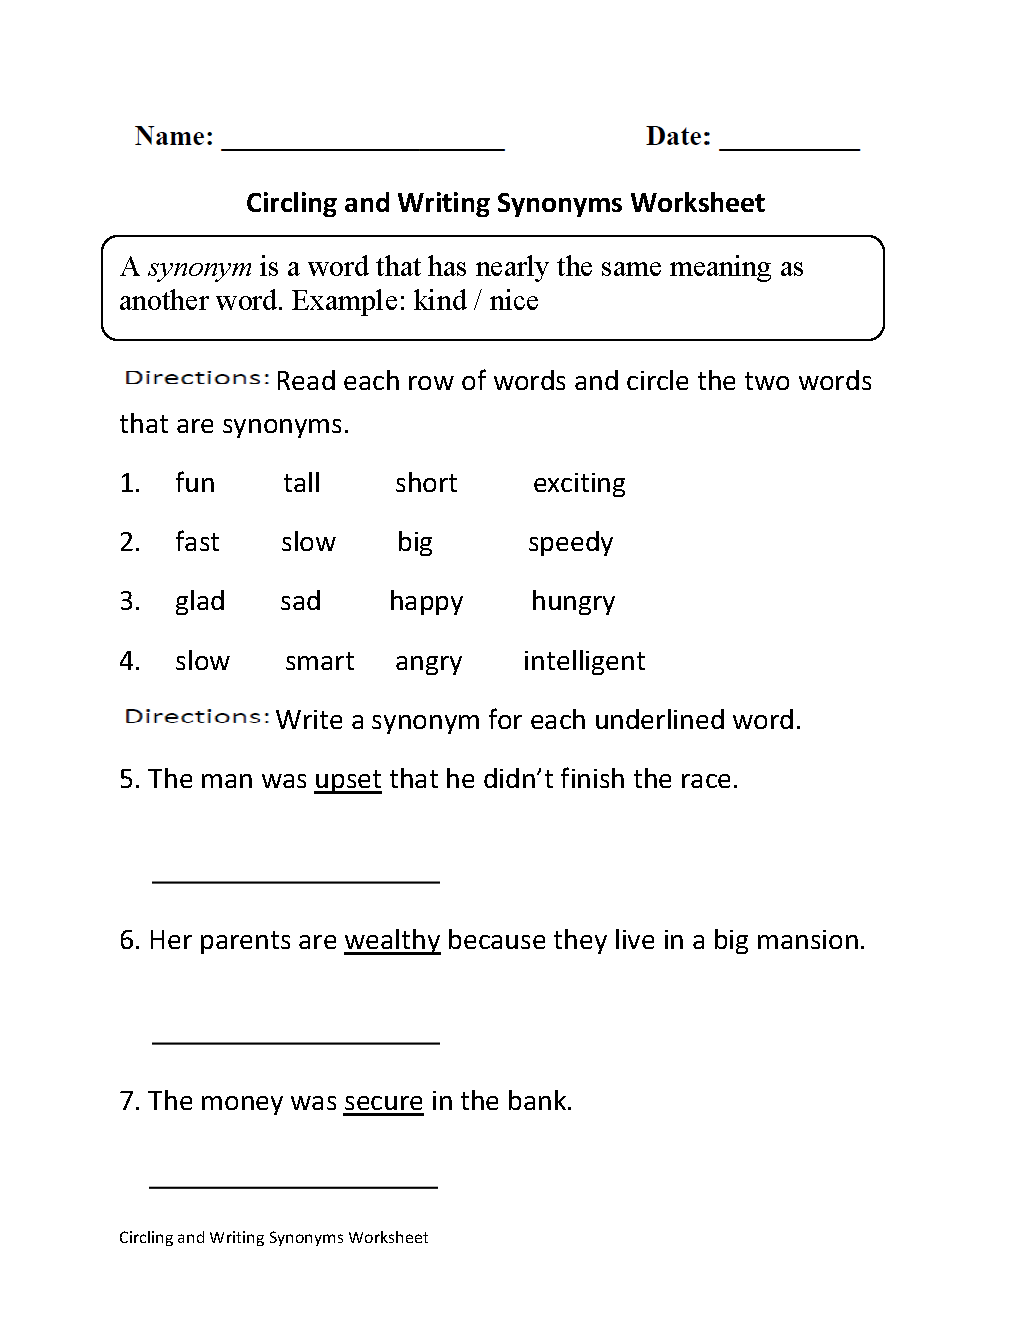 Englishlinx.com   Synonyms Worksheets   Synonym worksheet [ 1331 x 1012 Pixel ]